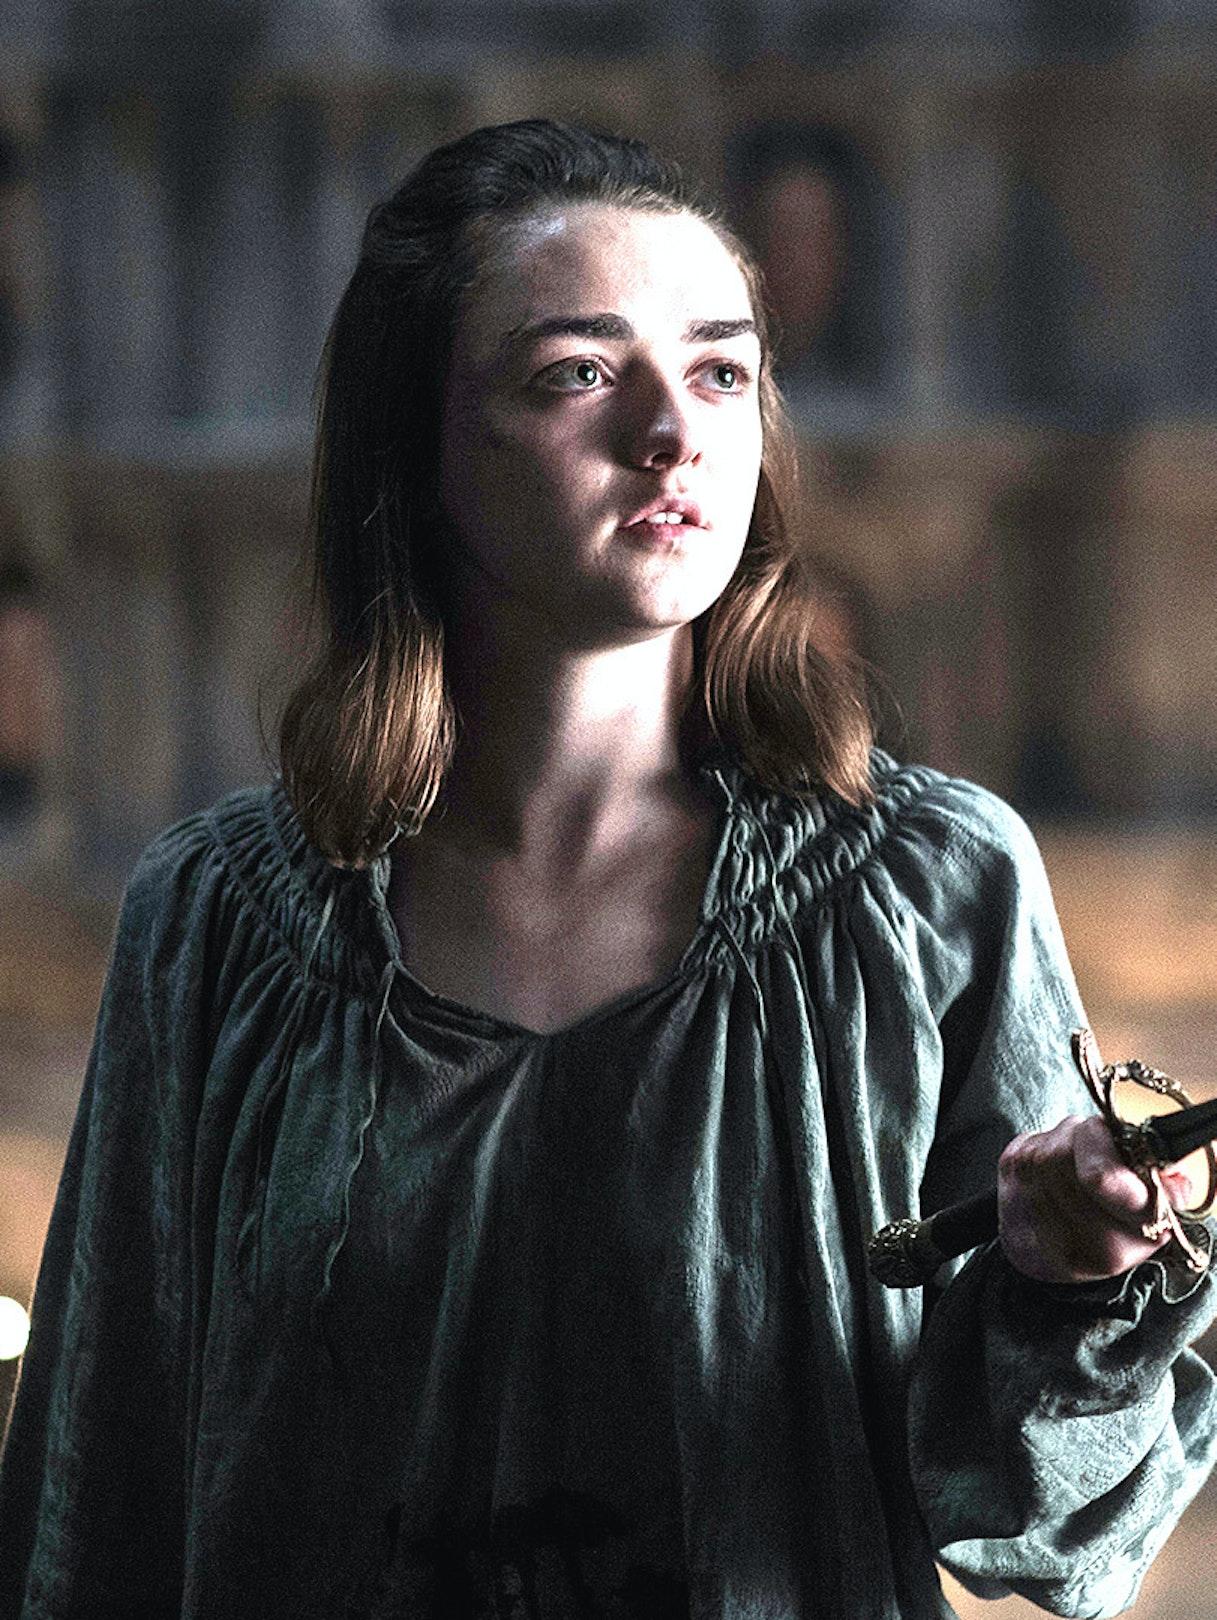 Arya Stark in 'Game of Thrones'